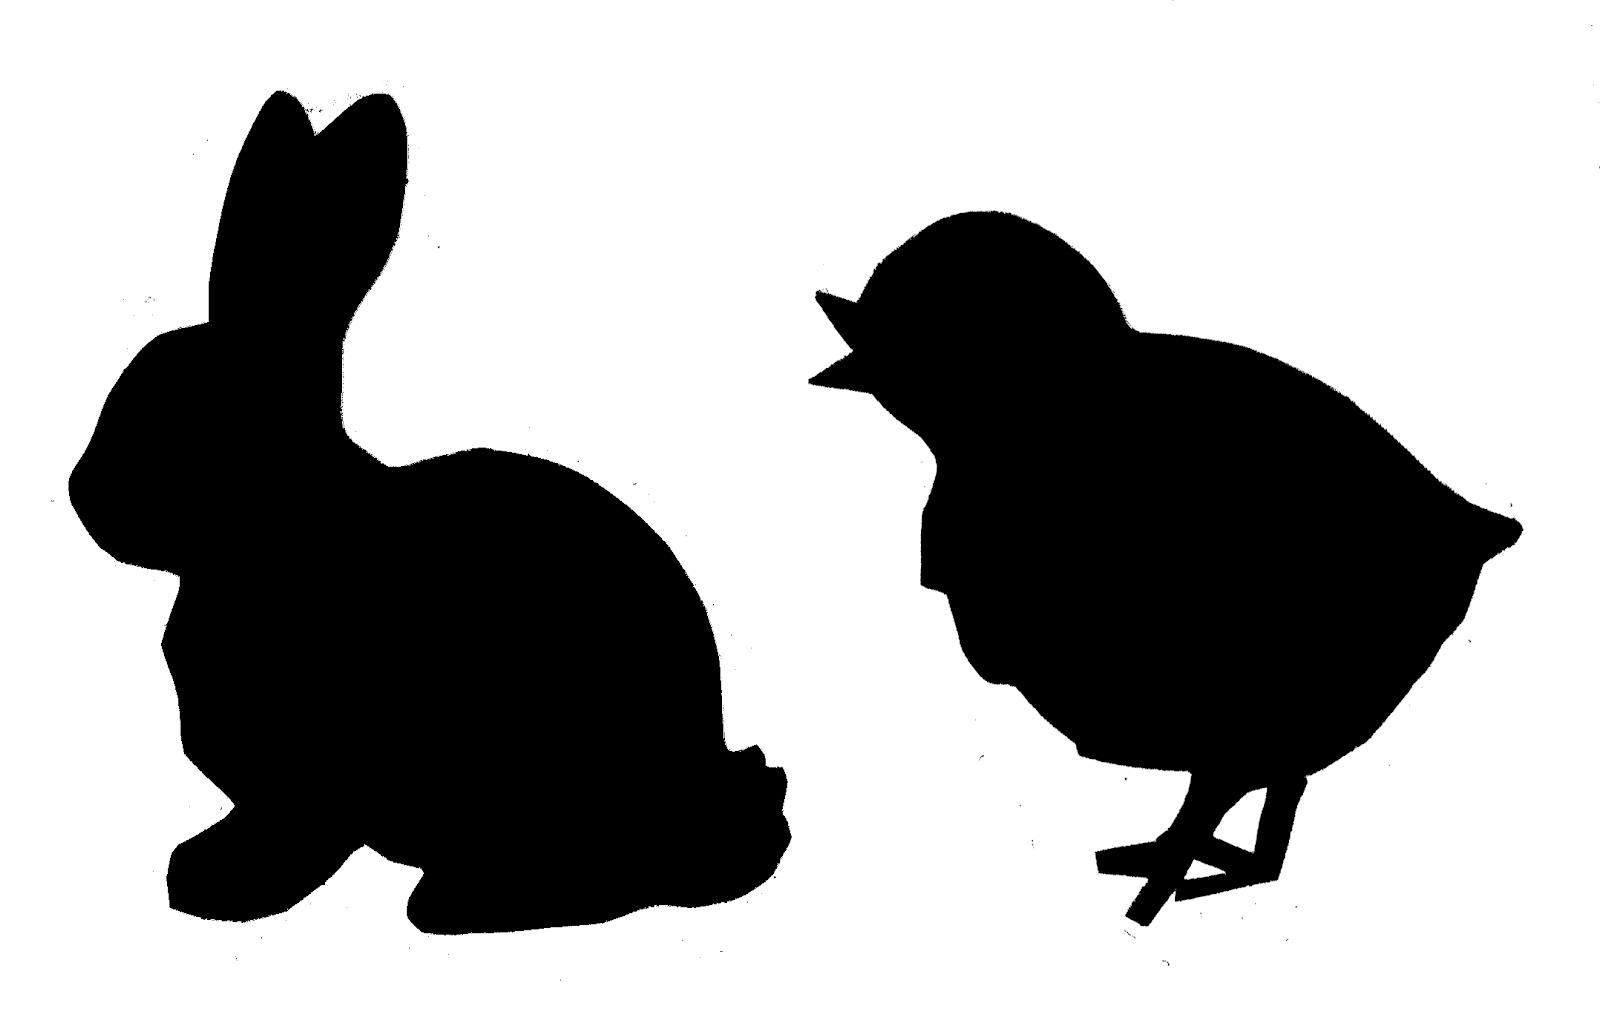 Easter basket silhouette clipart banner freeuse Silhouette easter clipart - ClipartFest banner freeuse